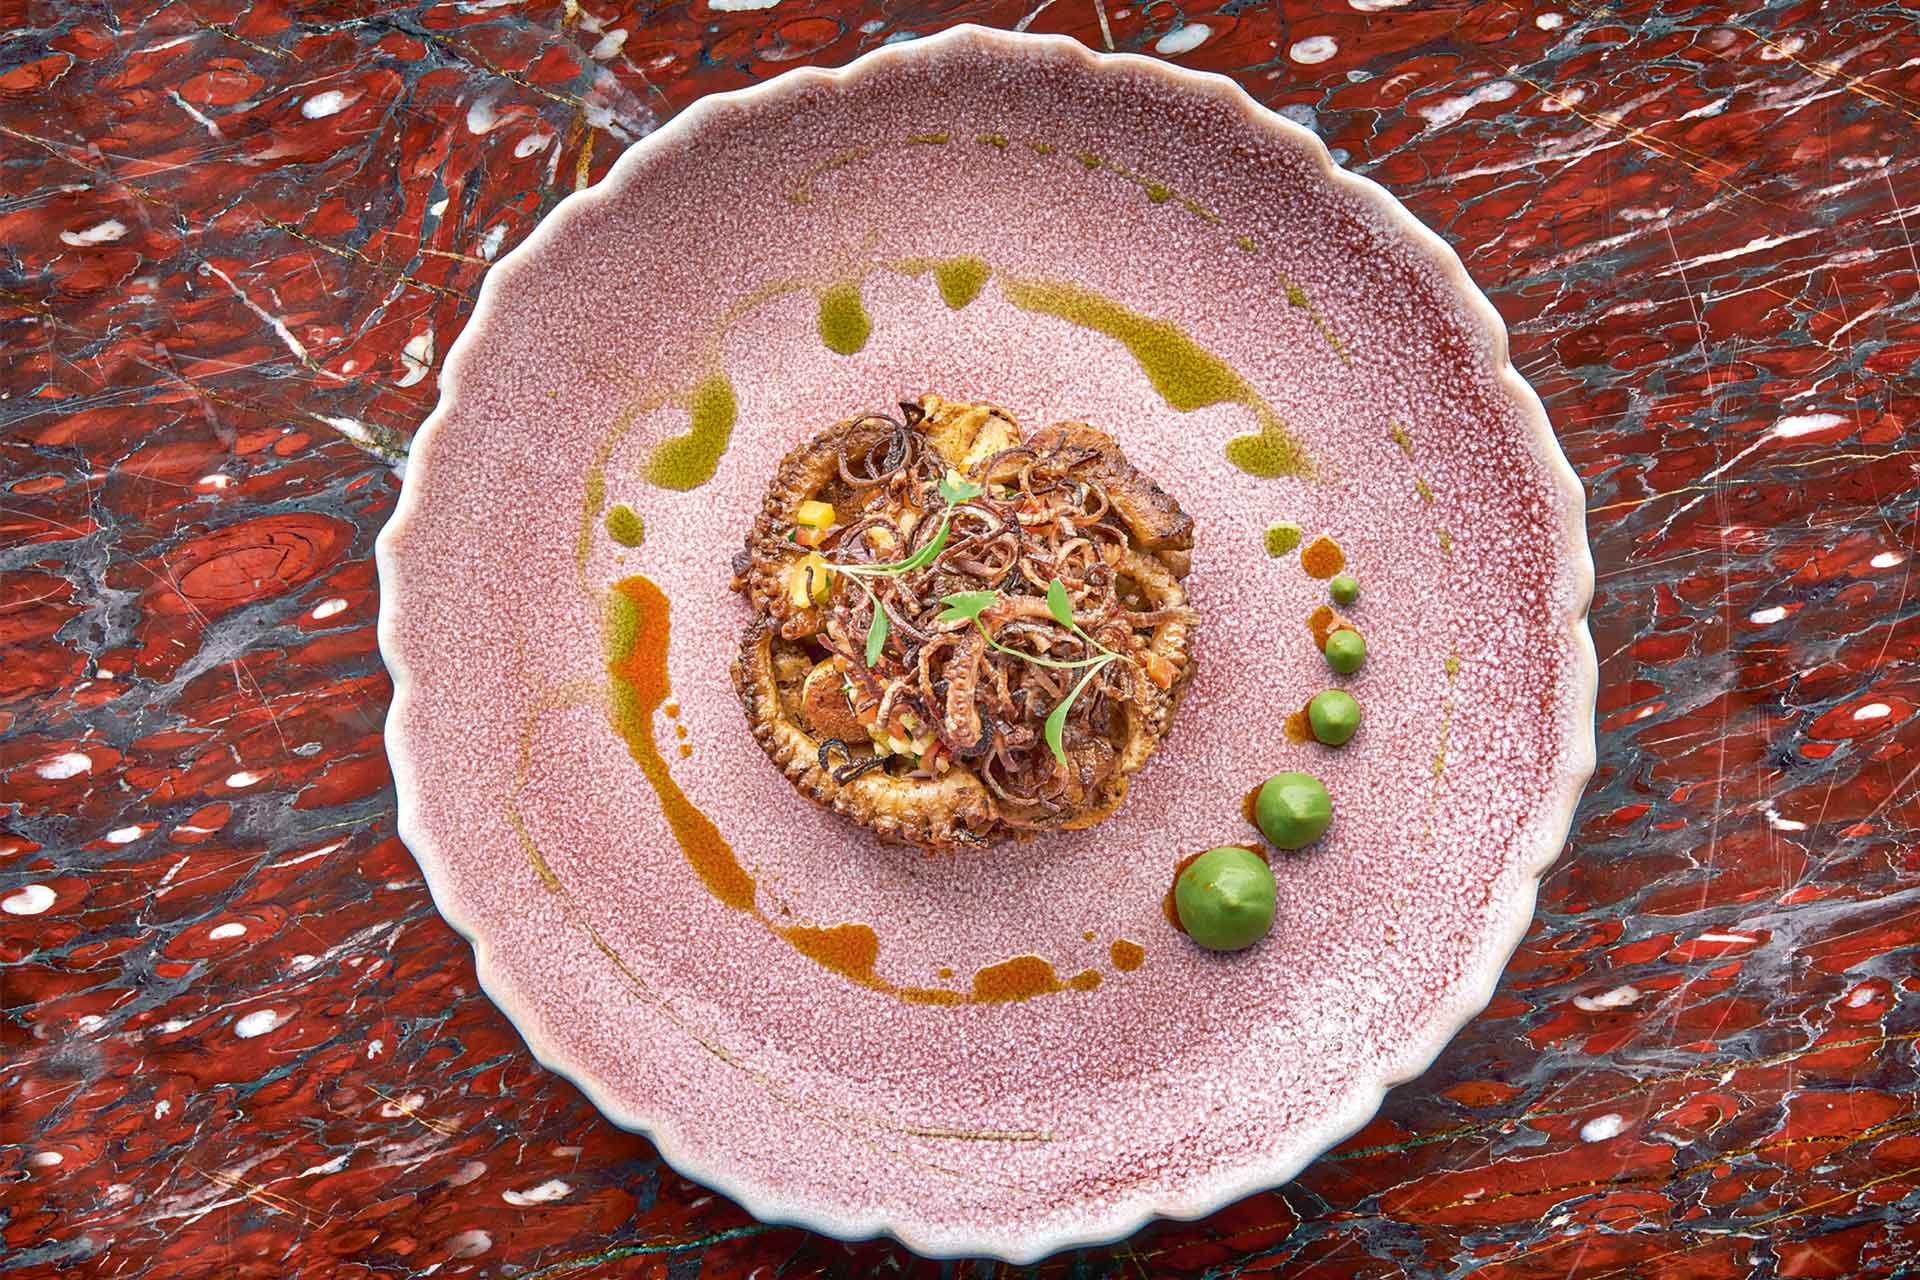 Ella Canta serves an eye-catching octopus dish